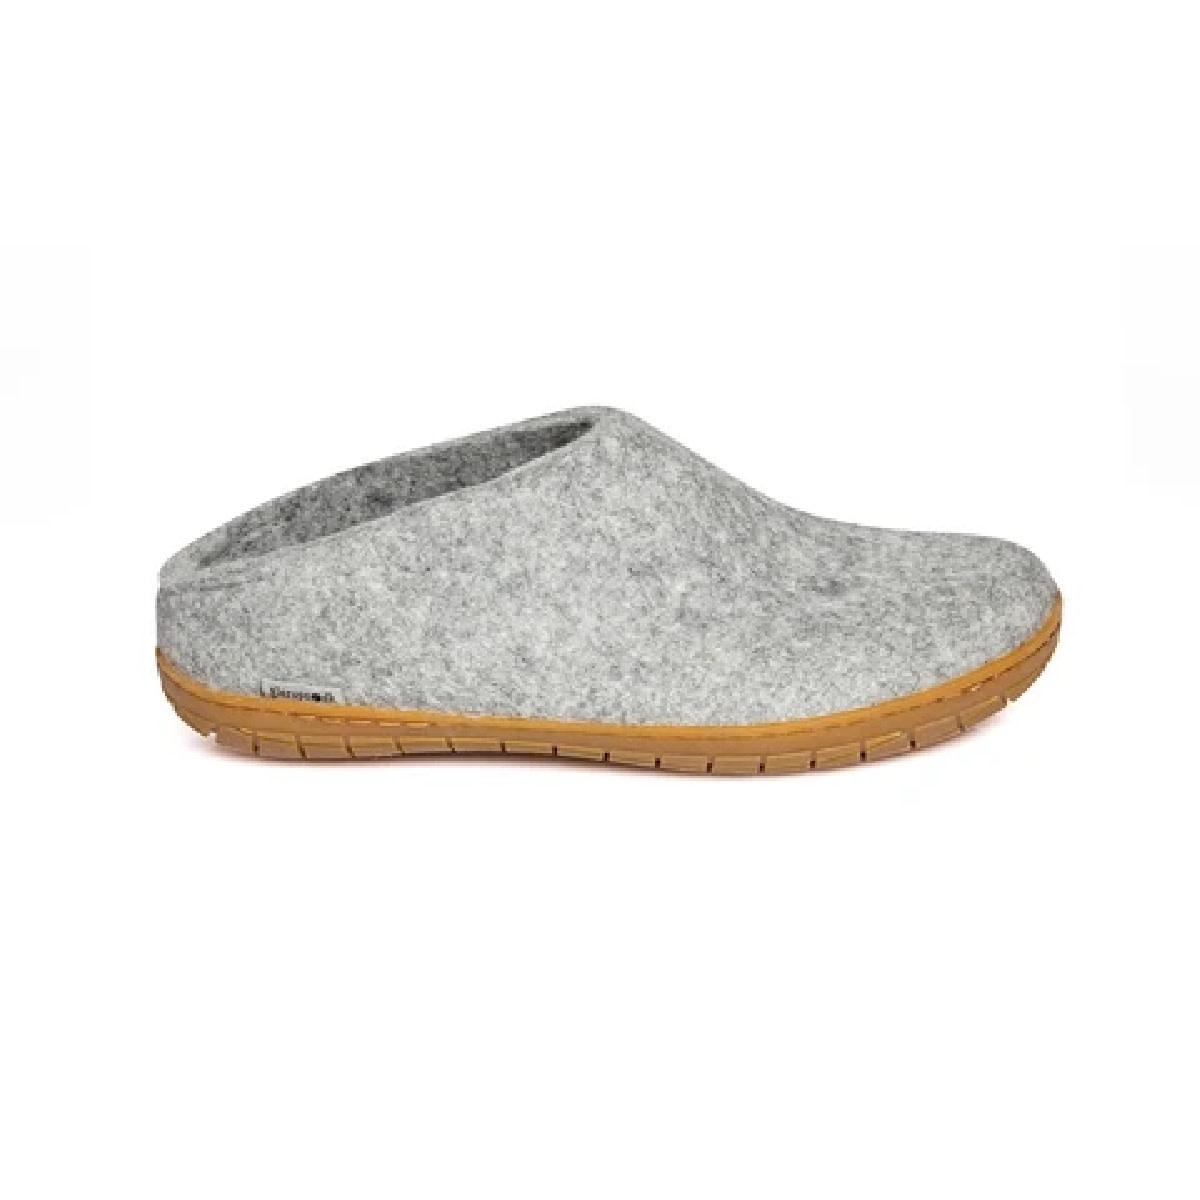 Glerups Glerups Women's Slipper Rubber Sole Grey